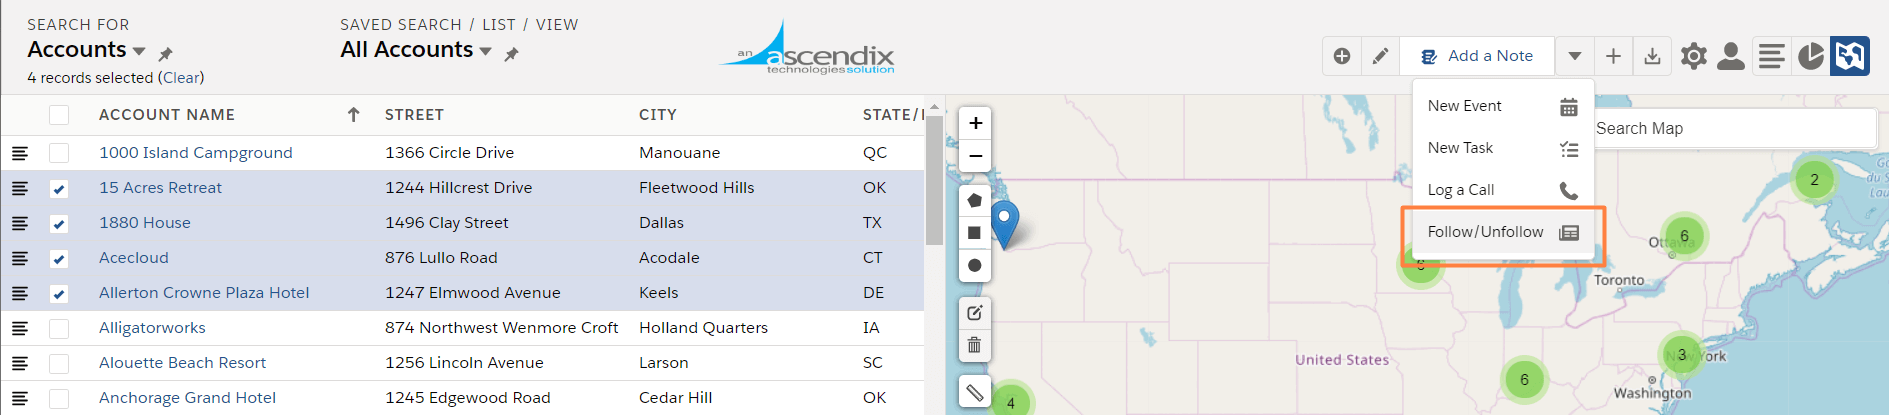 Ascendix-Search-for-Salesforce-mass-follow-unfollow